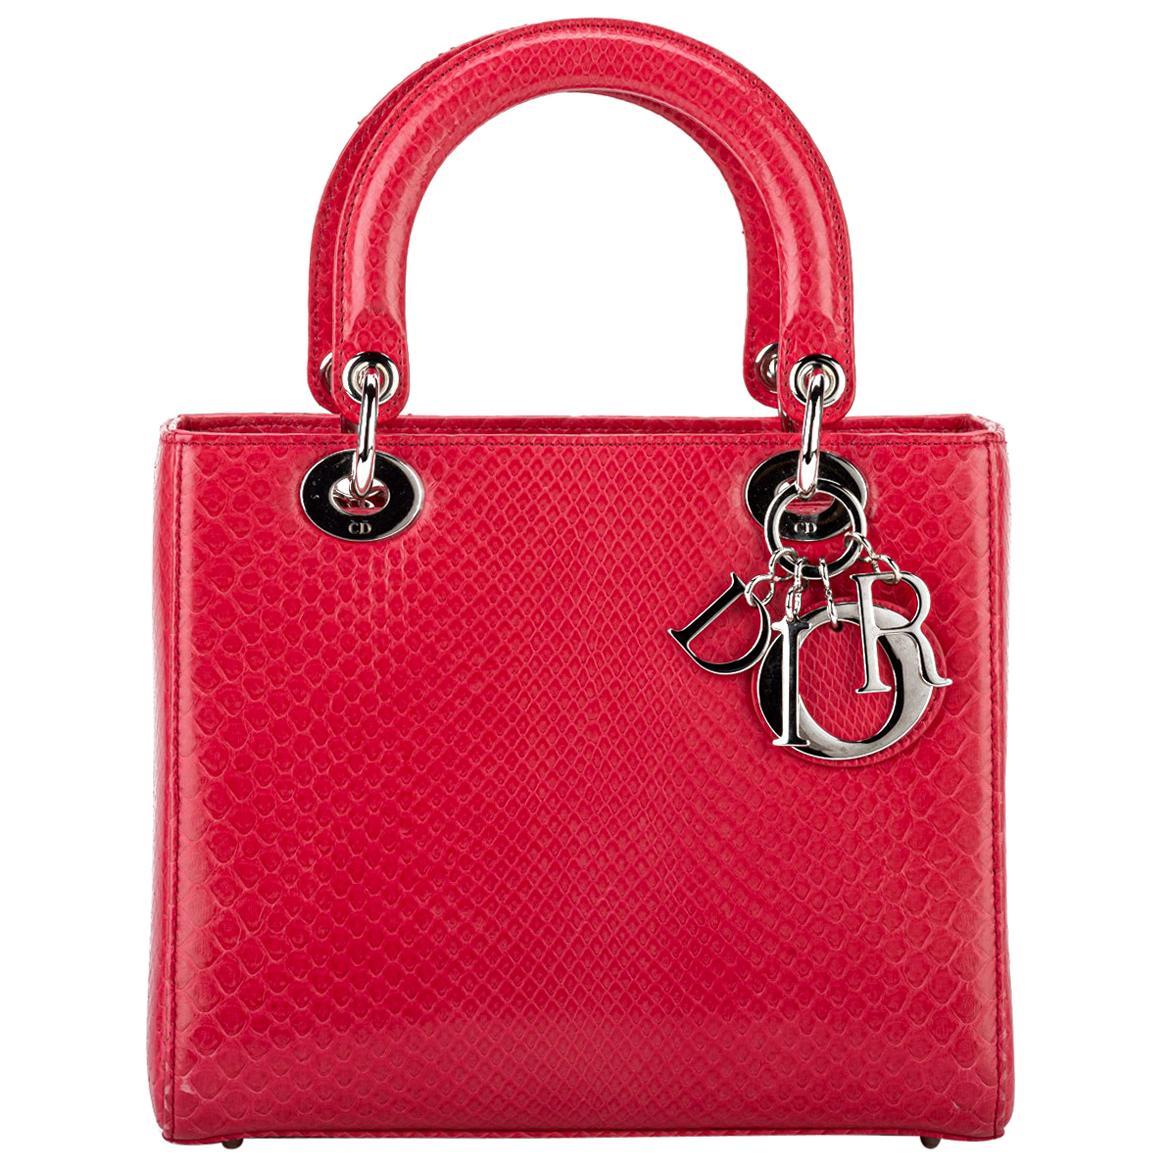 Lady Dior Large Red Python Bag